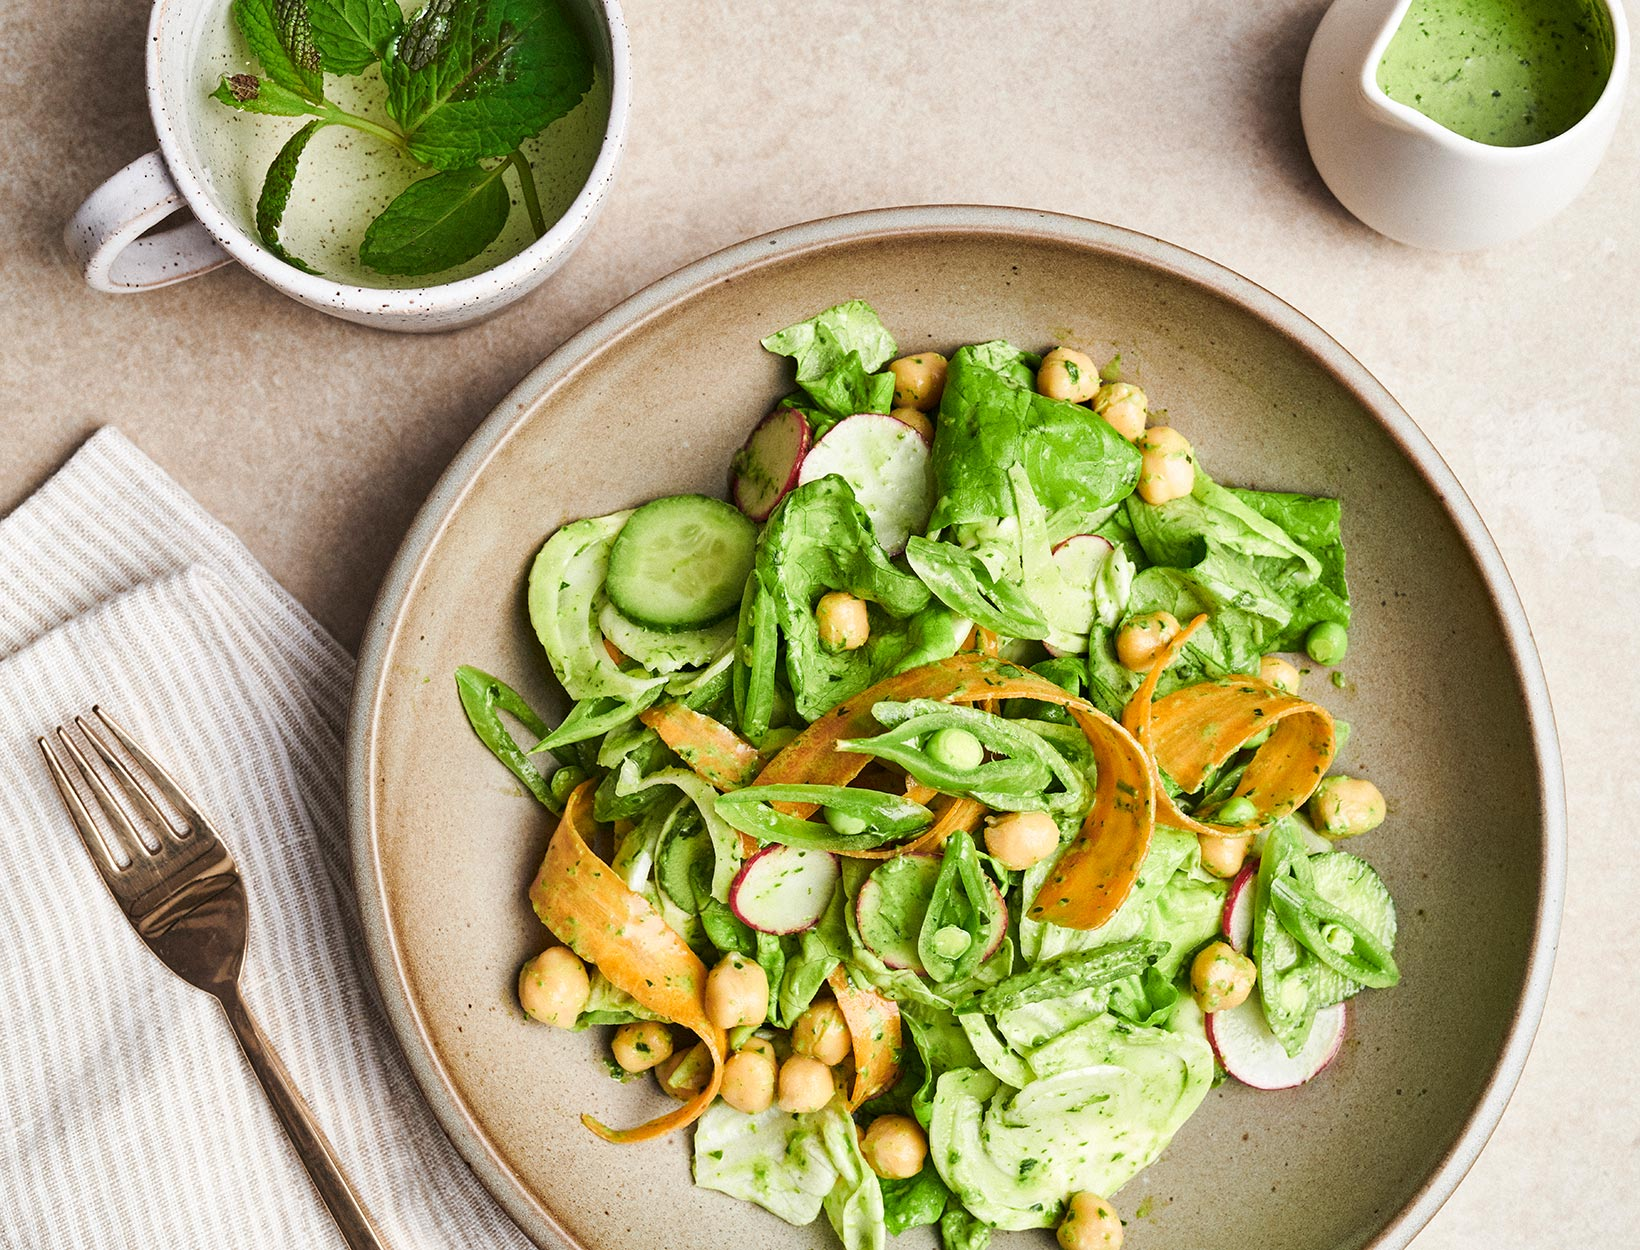 Crunchy Salad with Greener Goddess Dressing